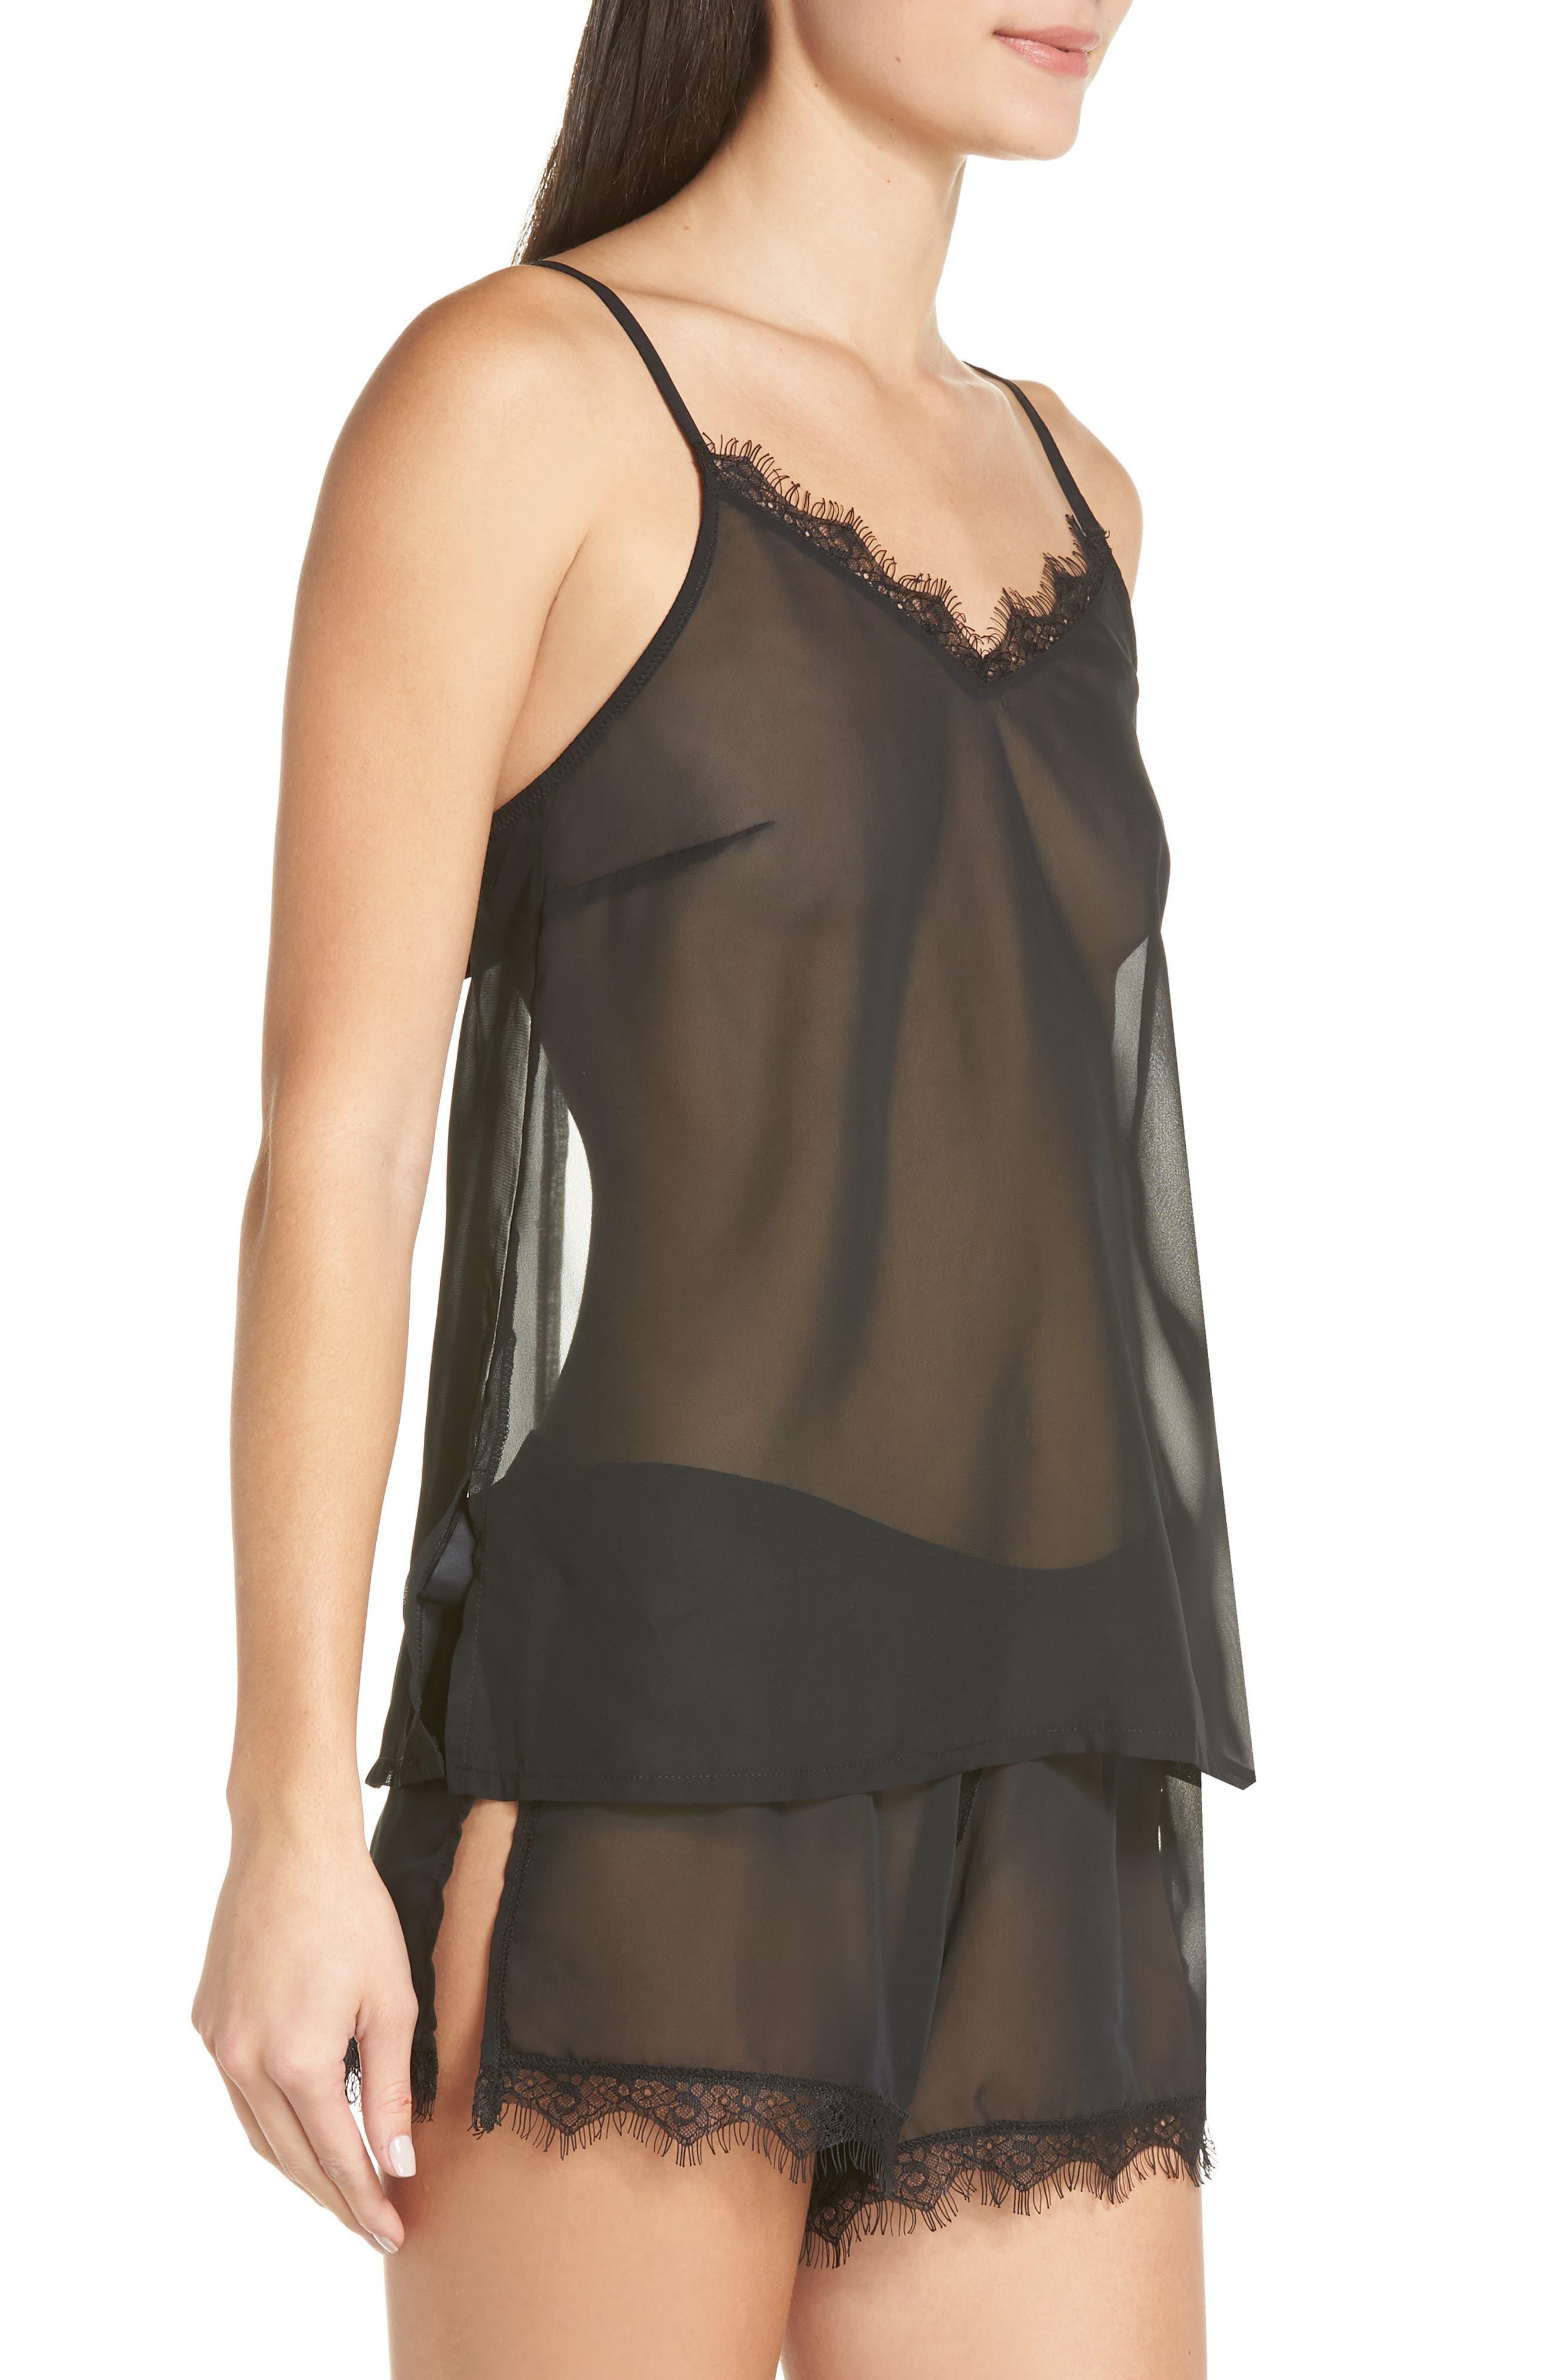 Copper Sheer Short Pajamas,                             Alternate thumbnail 3, color,                             BLACK